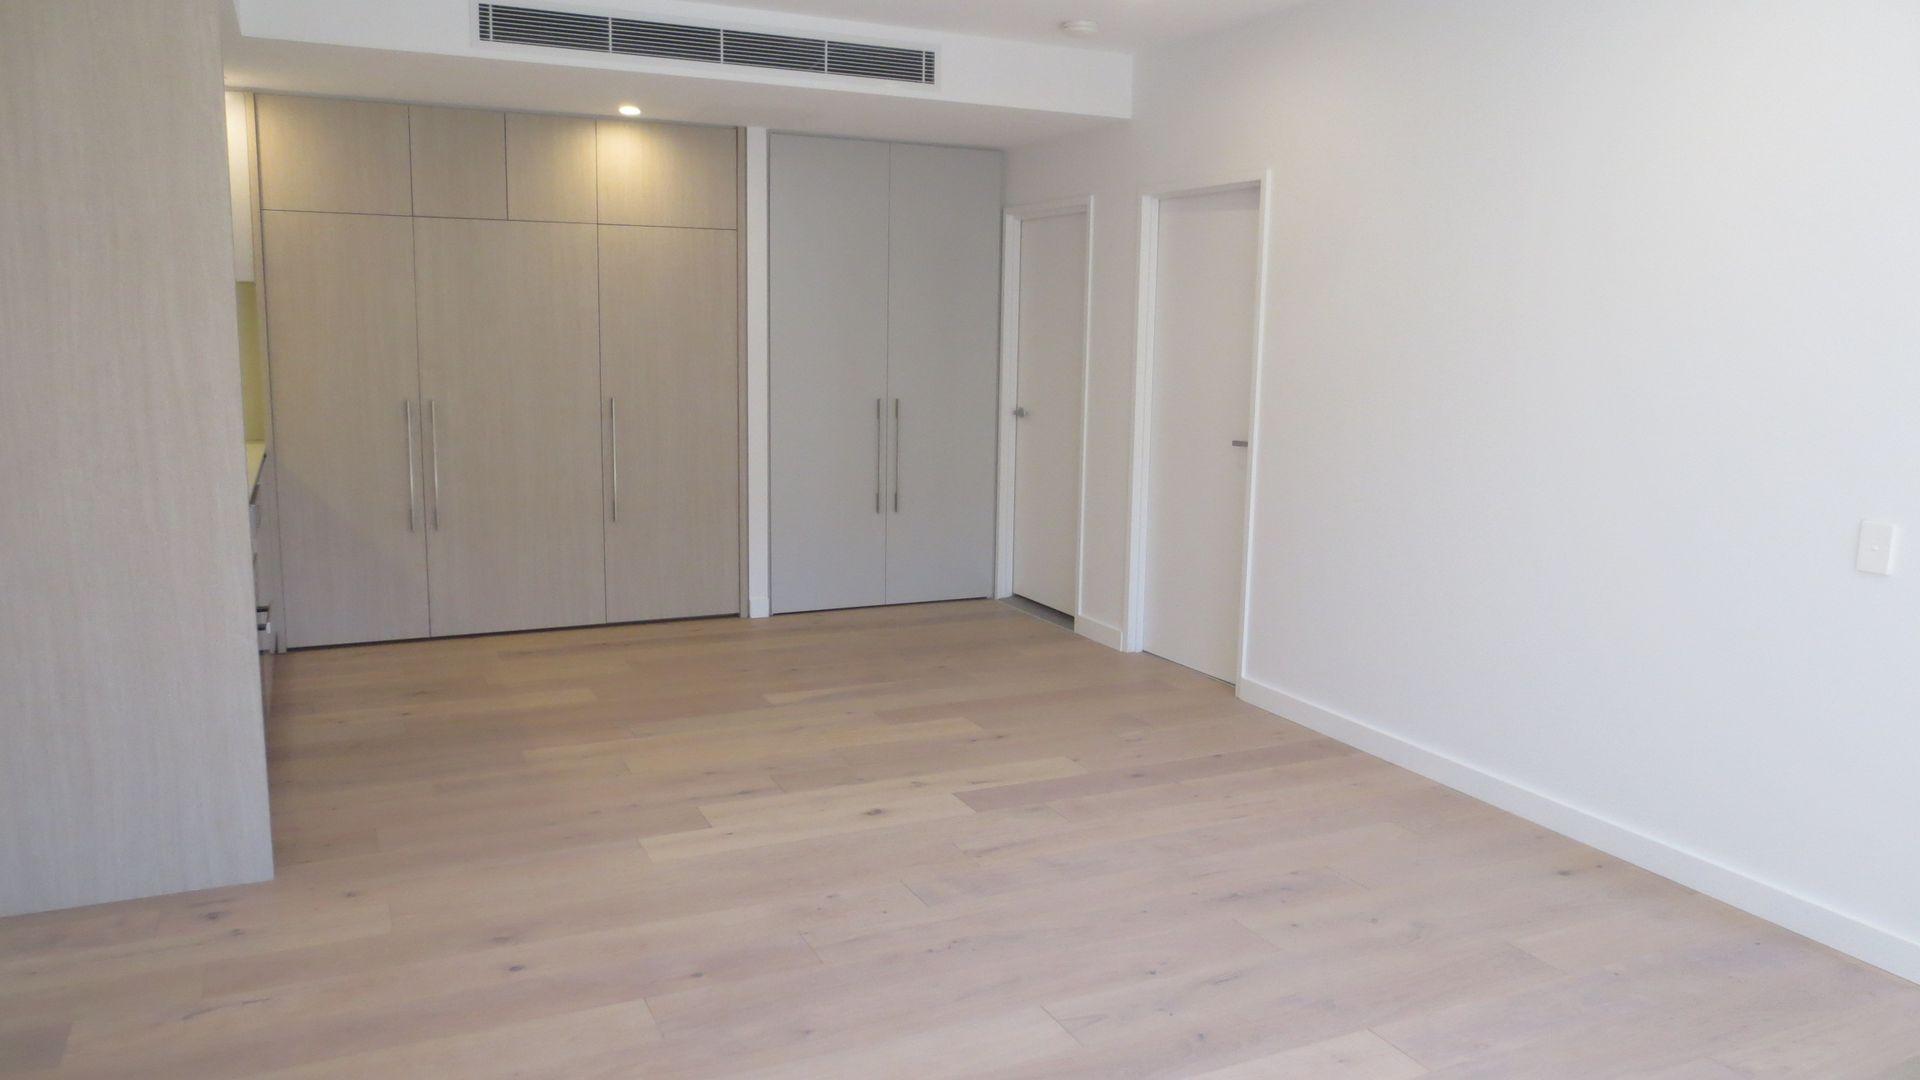 4.206 18 Hannah Street, Beecroft NSW 2119, Image 1